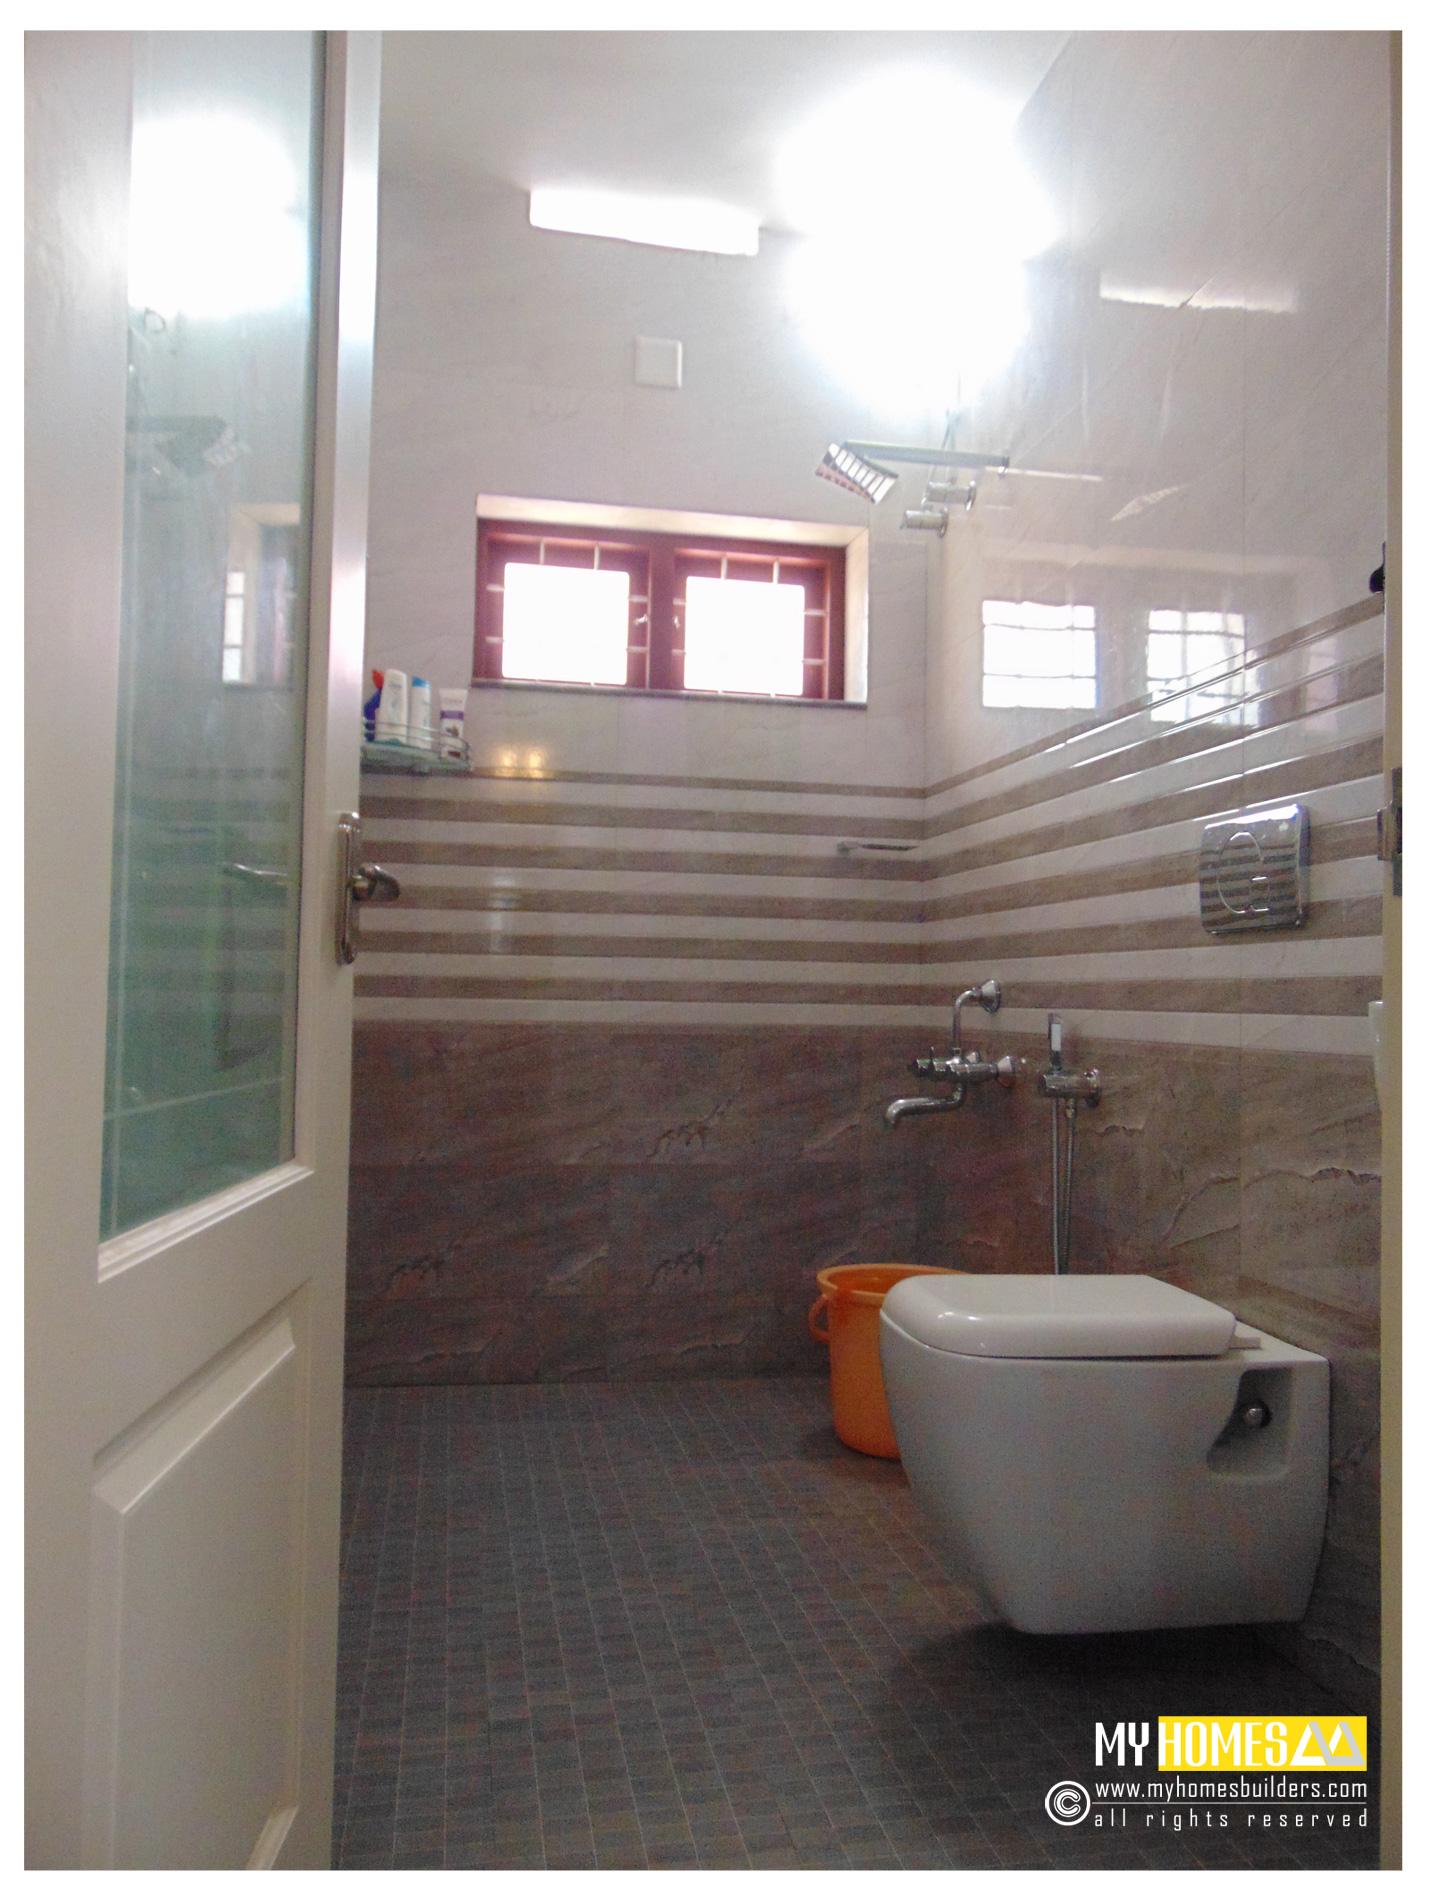 Bathroom designs in kerala photos and ideas from my homes on Bathroom Model  id=17397